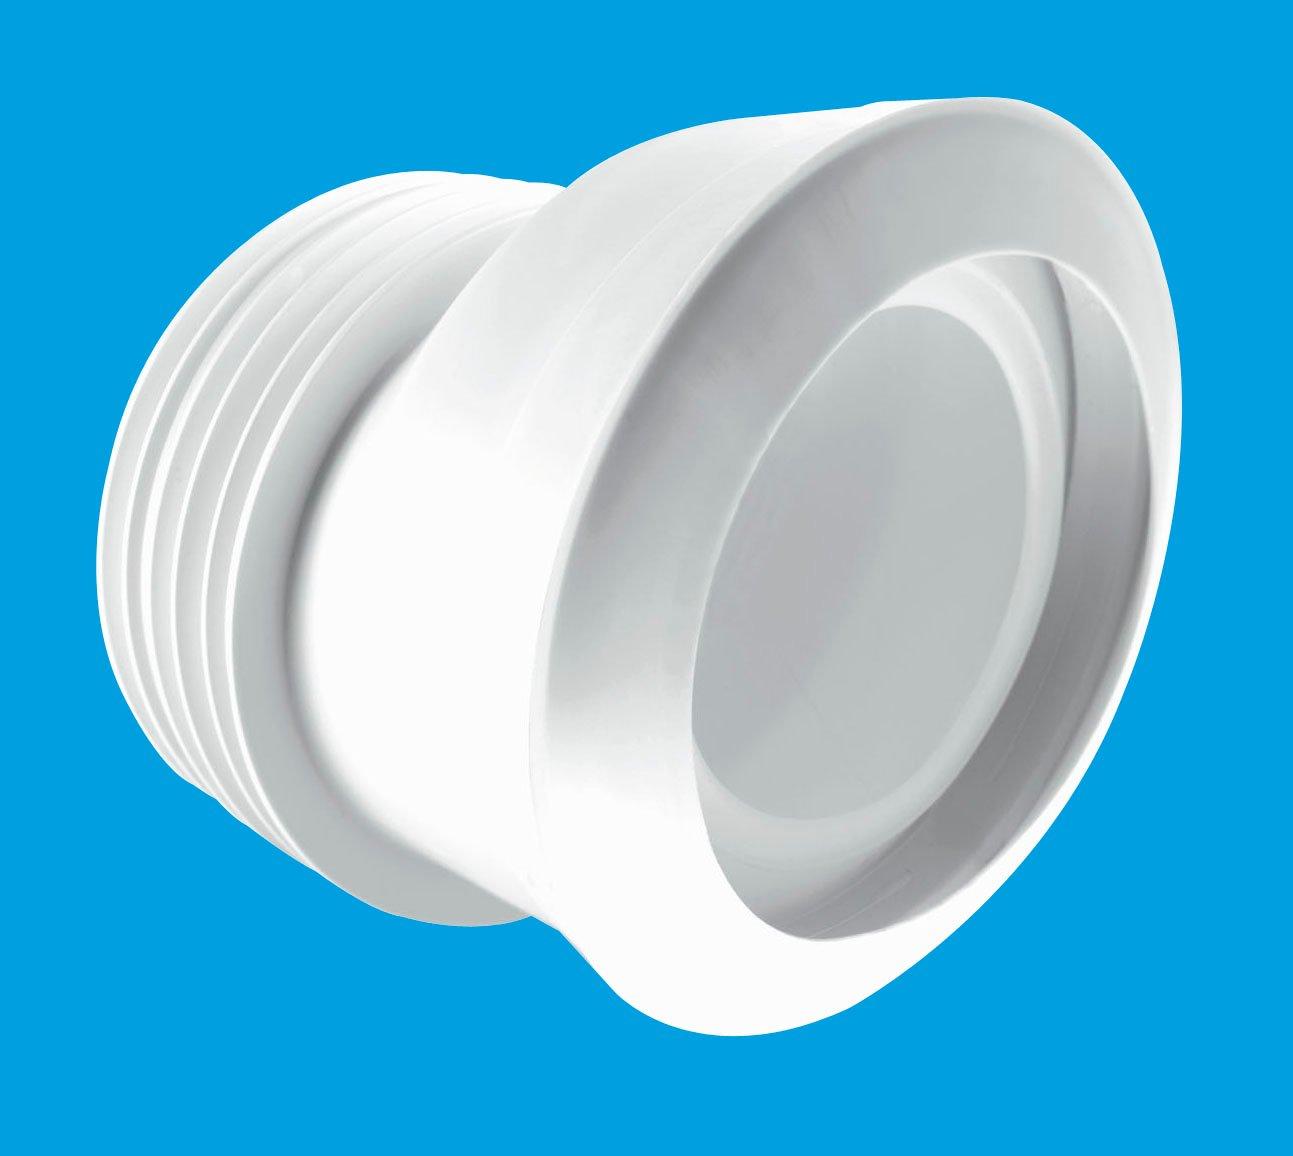 20mm Offset MACFIT WC Connector